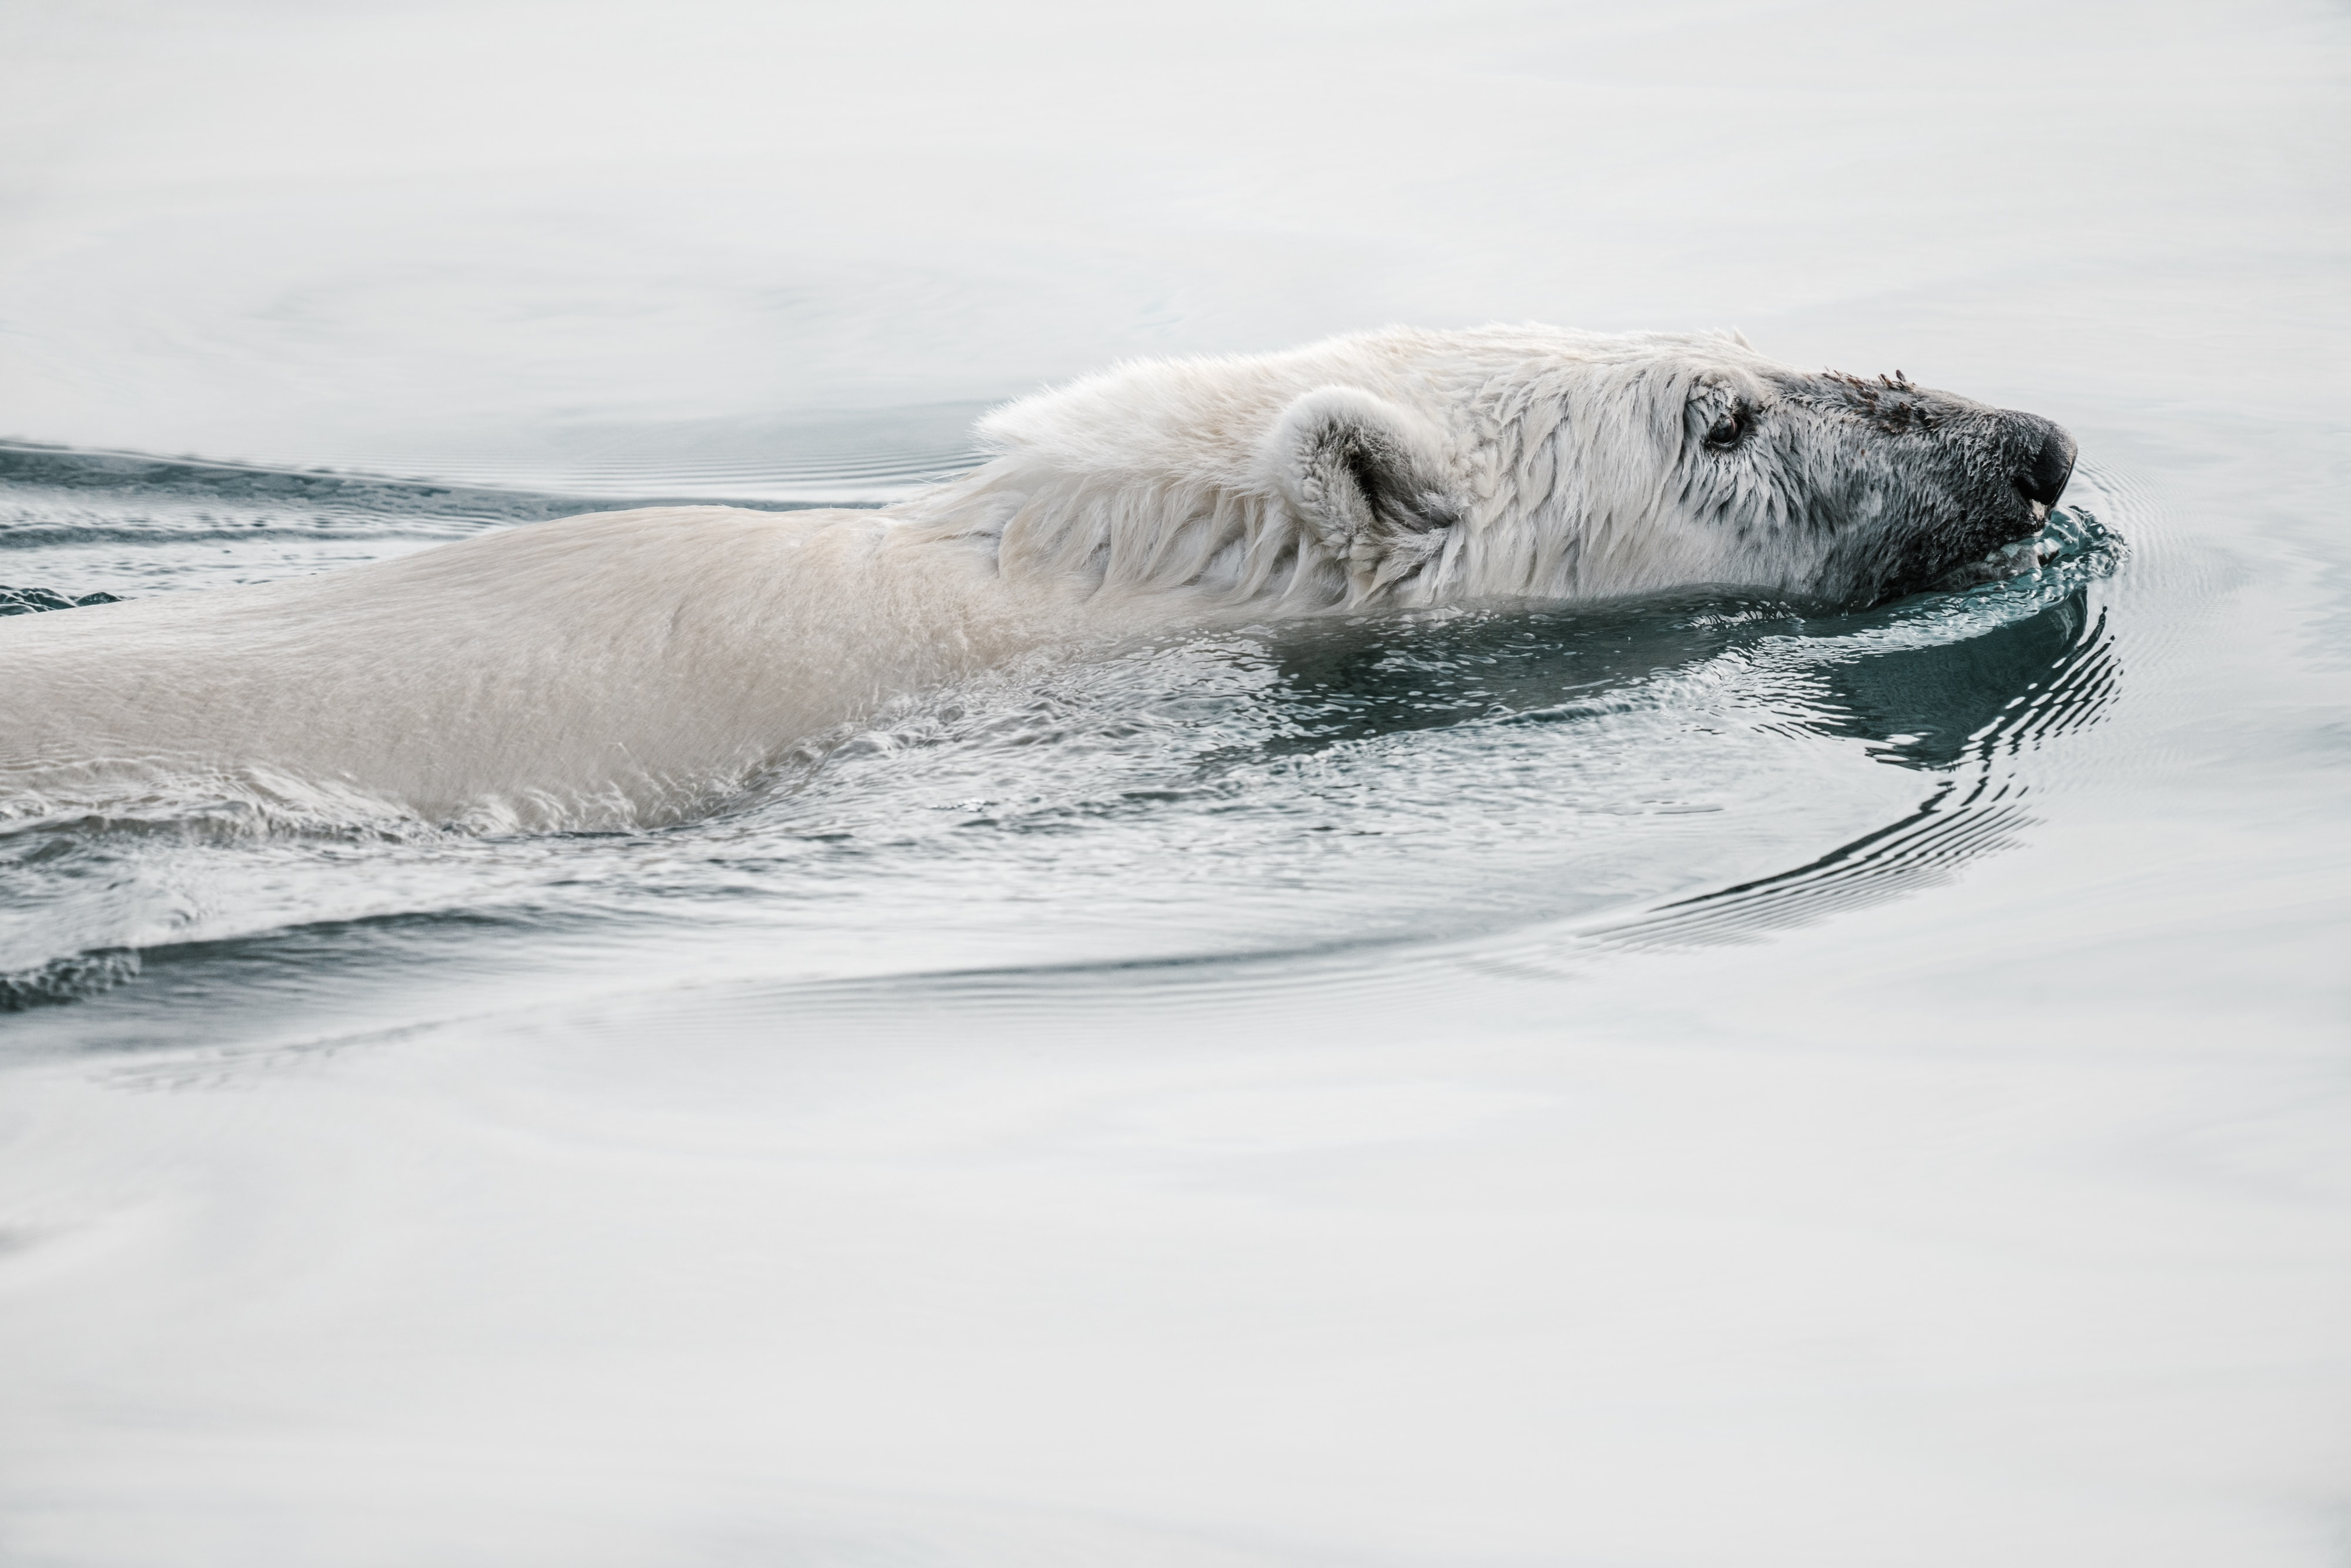 white polar bear on calm body of water